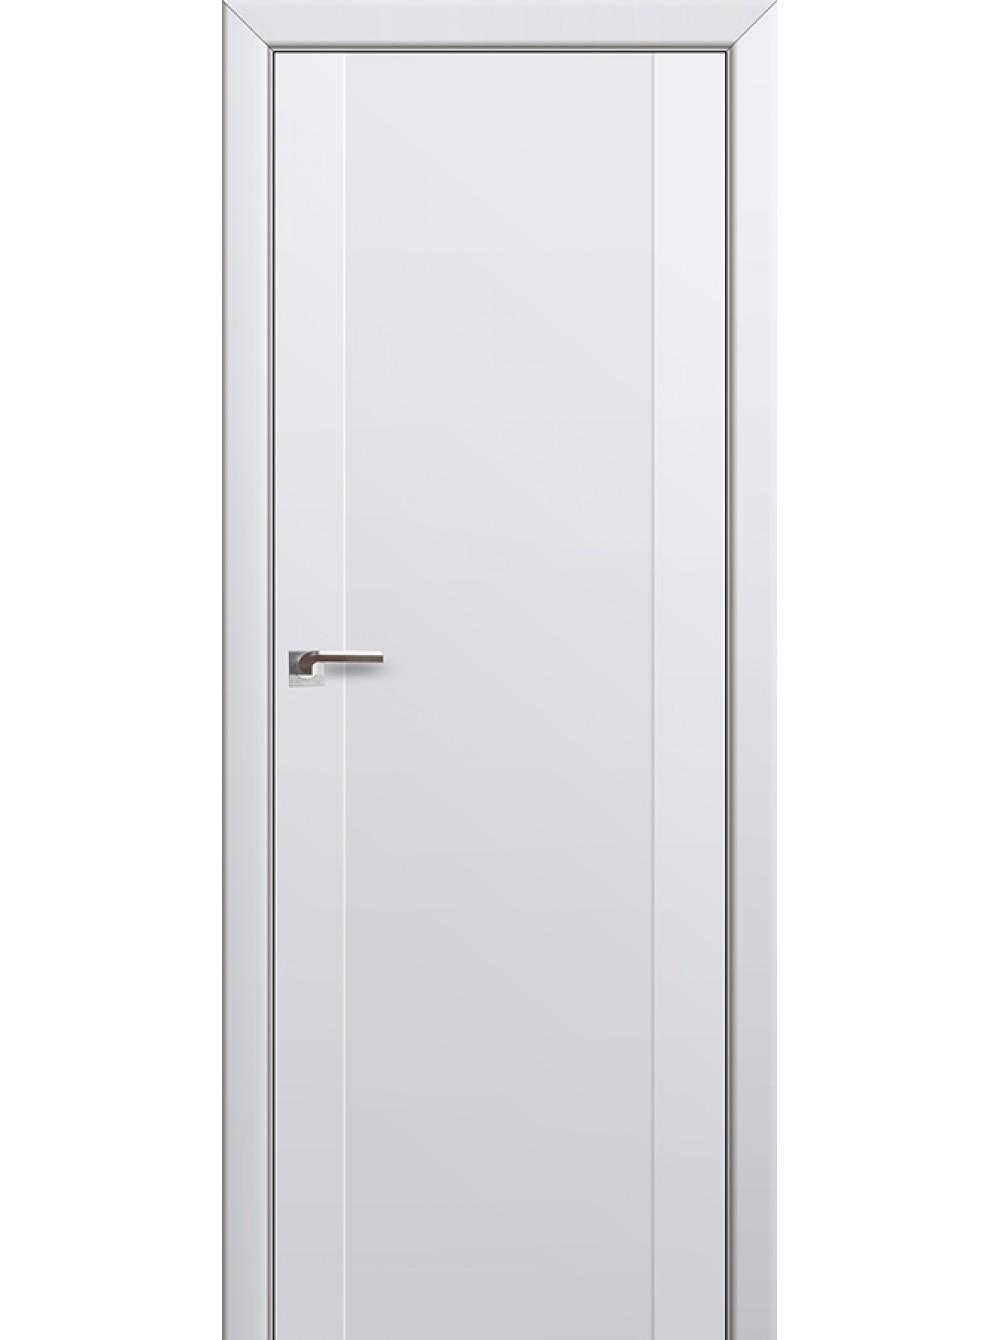 Комплект раздвижной двери Profildoors 20U (Аляска) 2000х600-800х36 мм (коробка, наличники, добор) фото